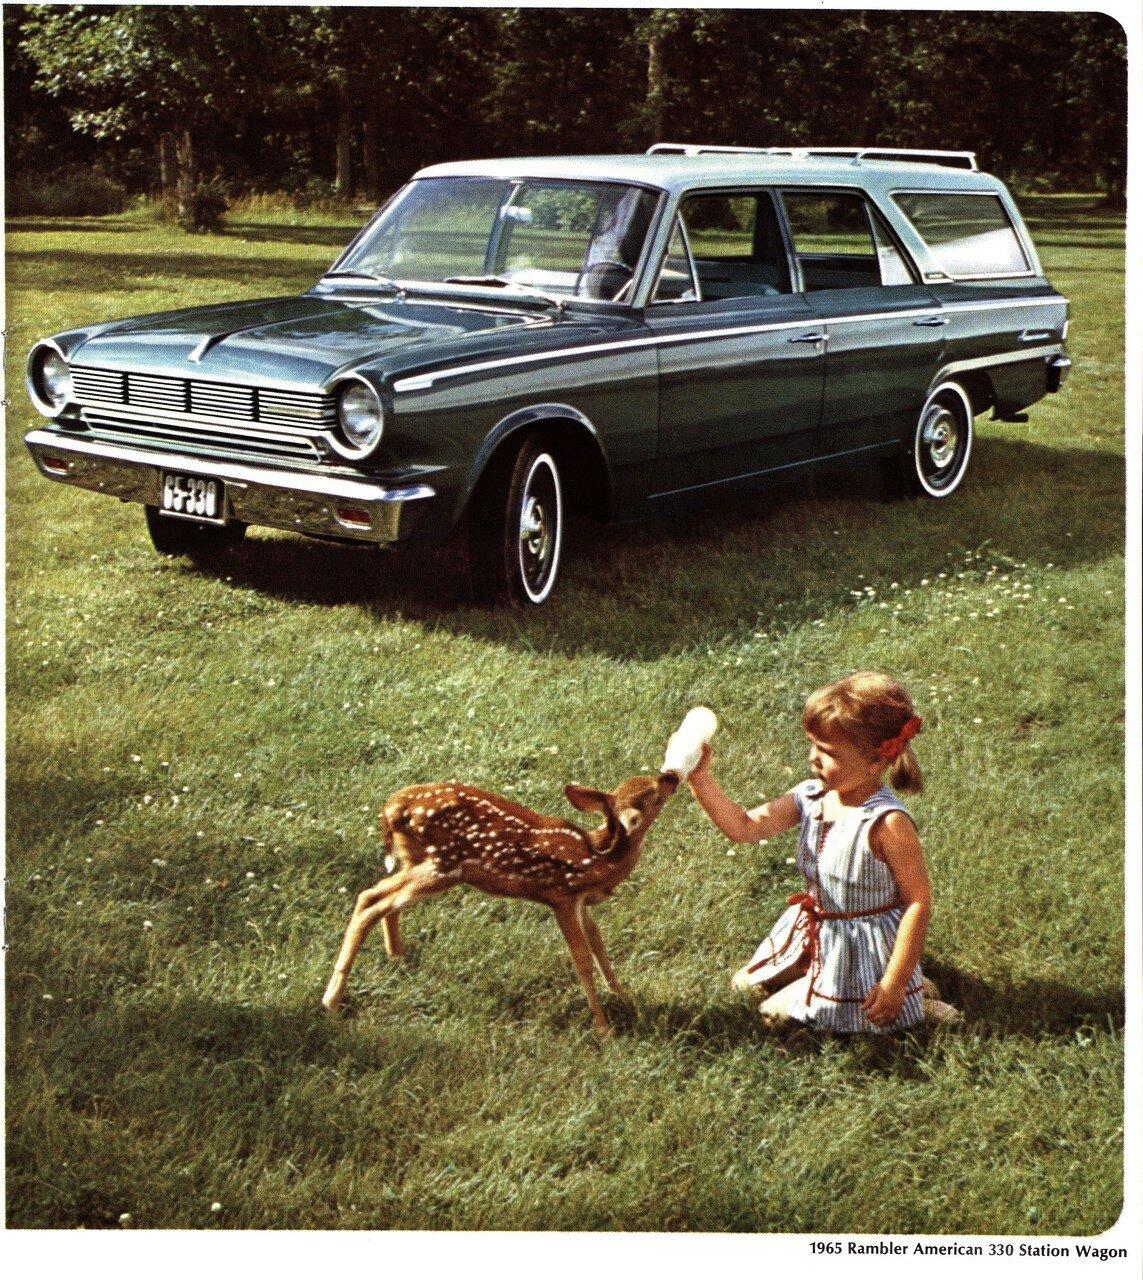 1965-Rambler-American-330-Station-Wagon-1.jpg